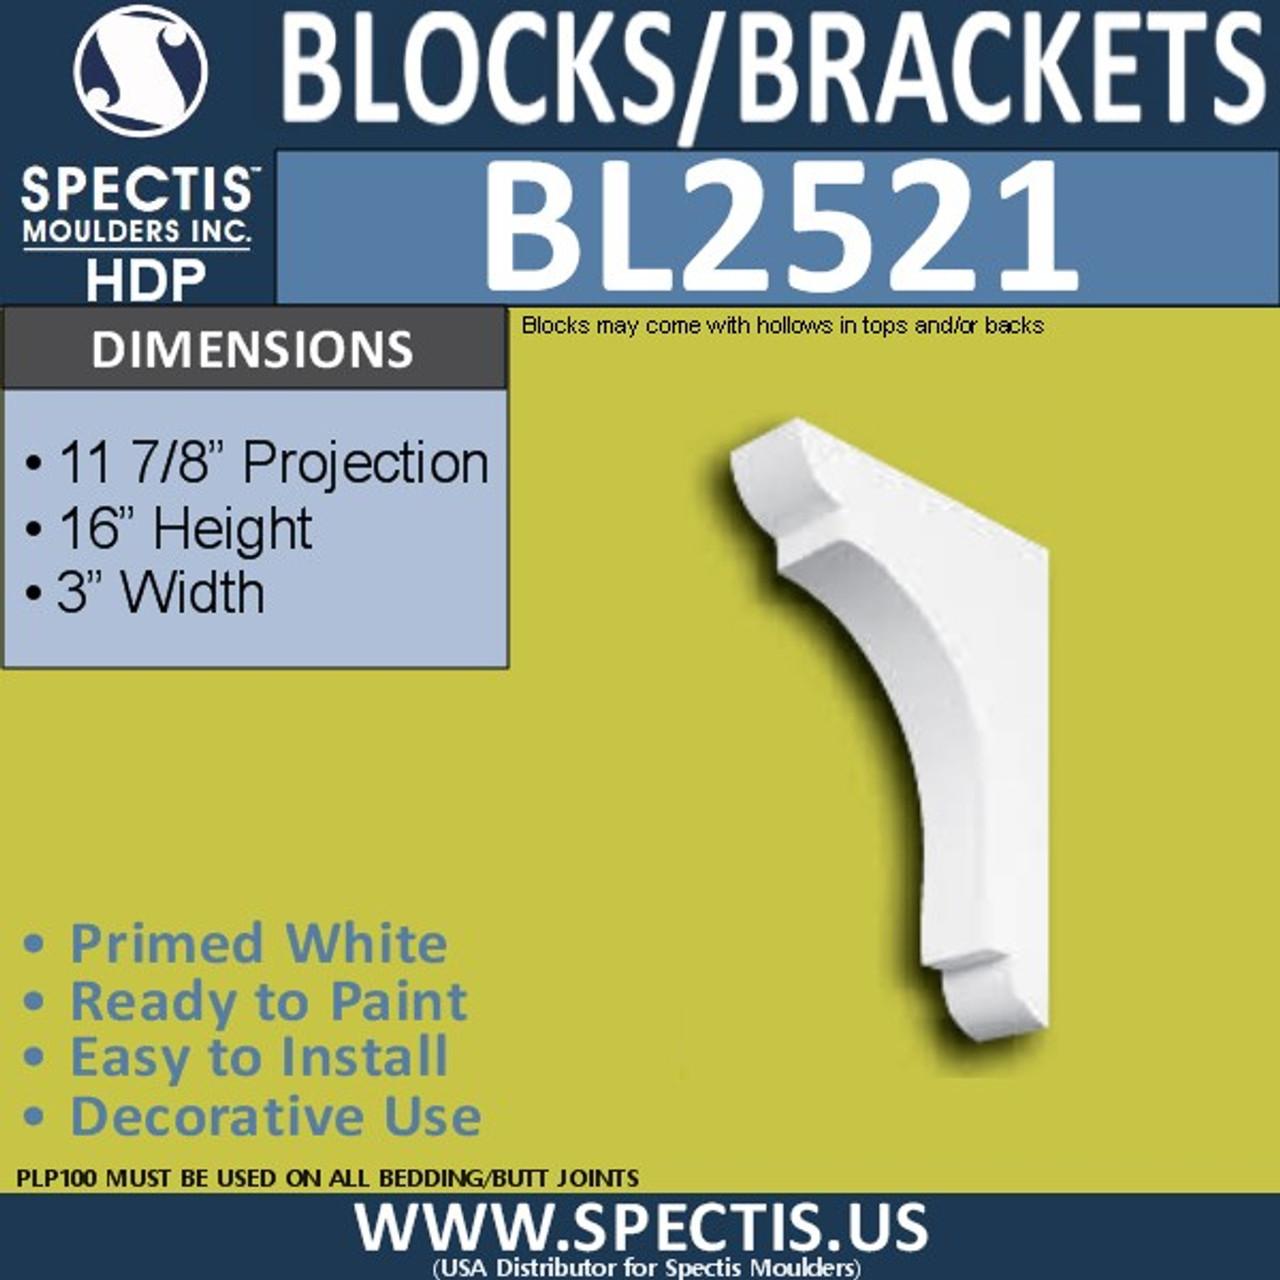 "BL2521 Eave Block or Bracket 3""W x 16""H x 12"" P"